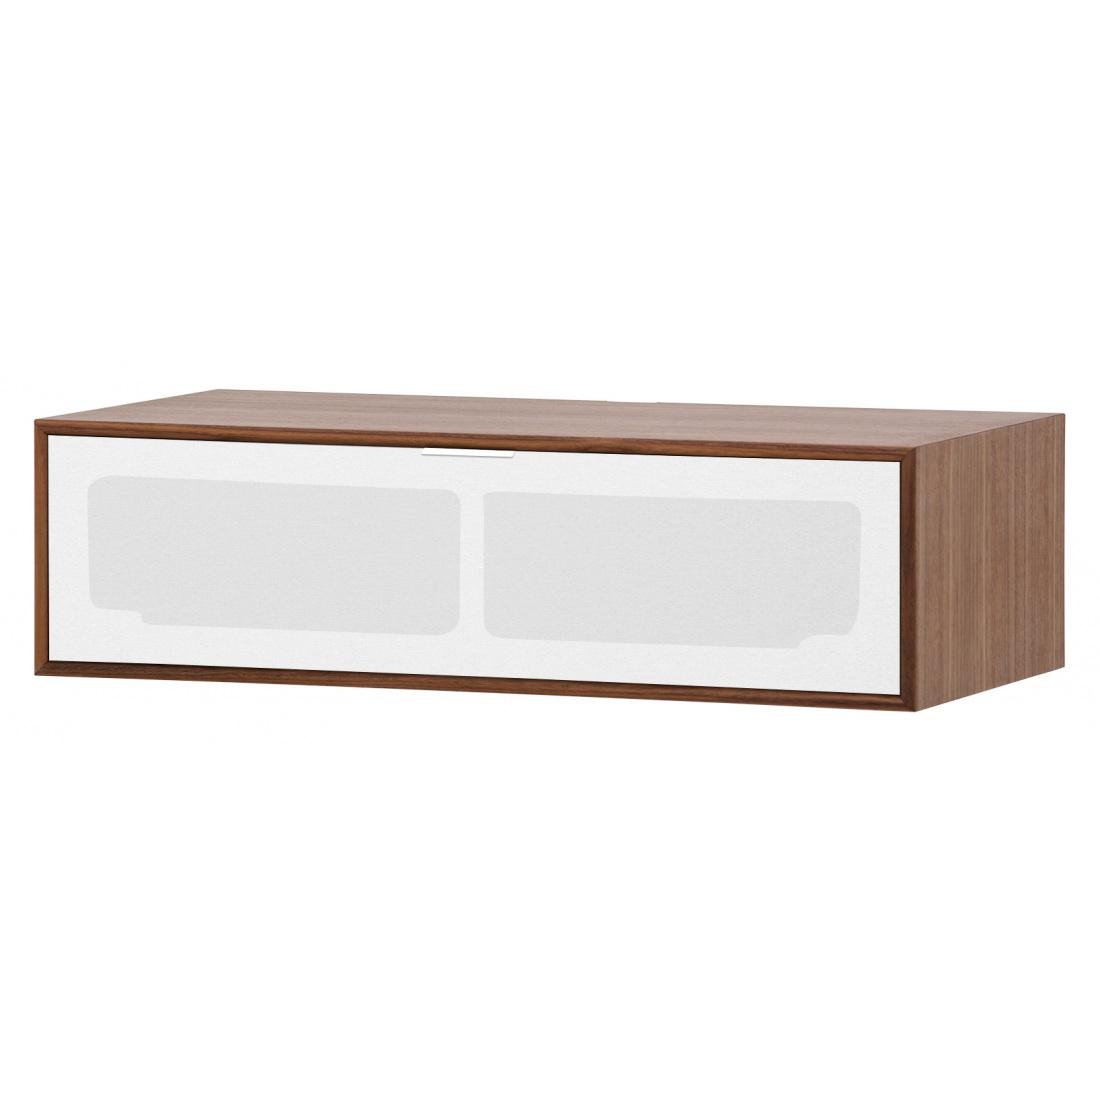 Lowboard Walnuss lowboard walnuss weiß sideboard tv schrank moebel liebe com